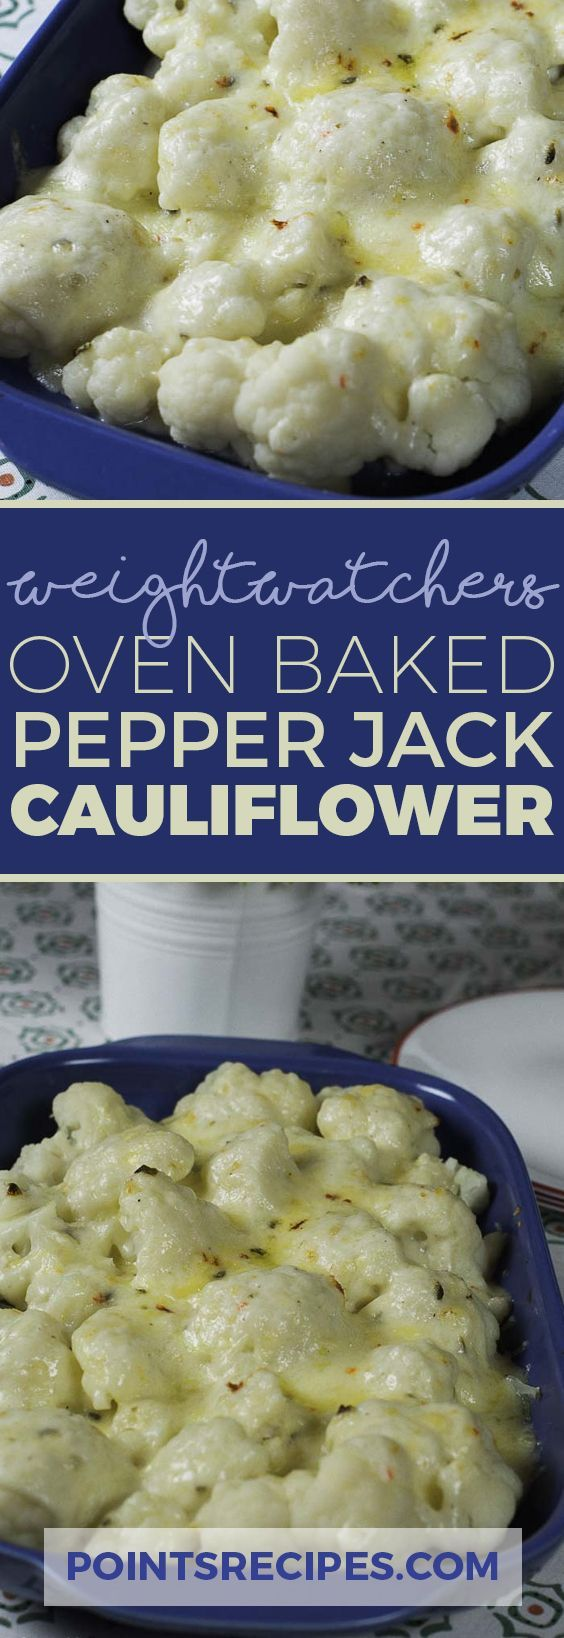 Baked Cauliflower with Pepper Jack Cheese (Weight Watchers SmartPoints)